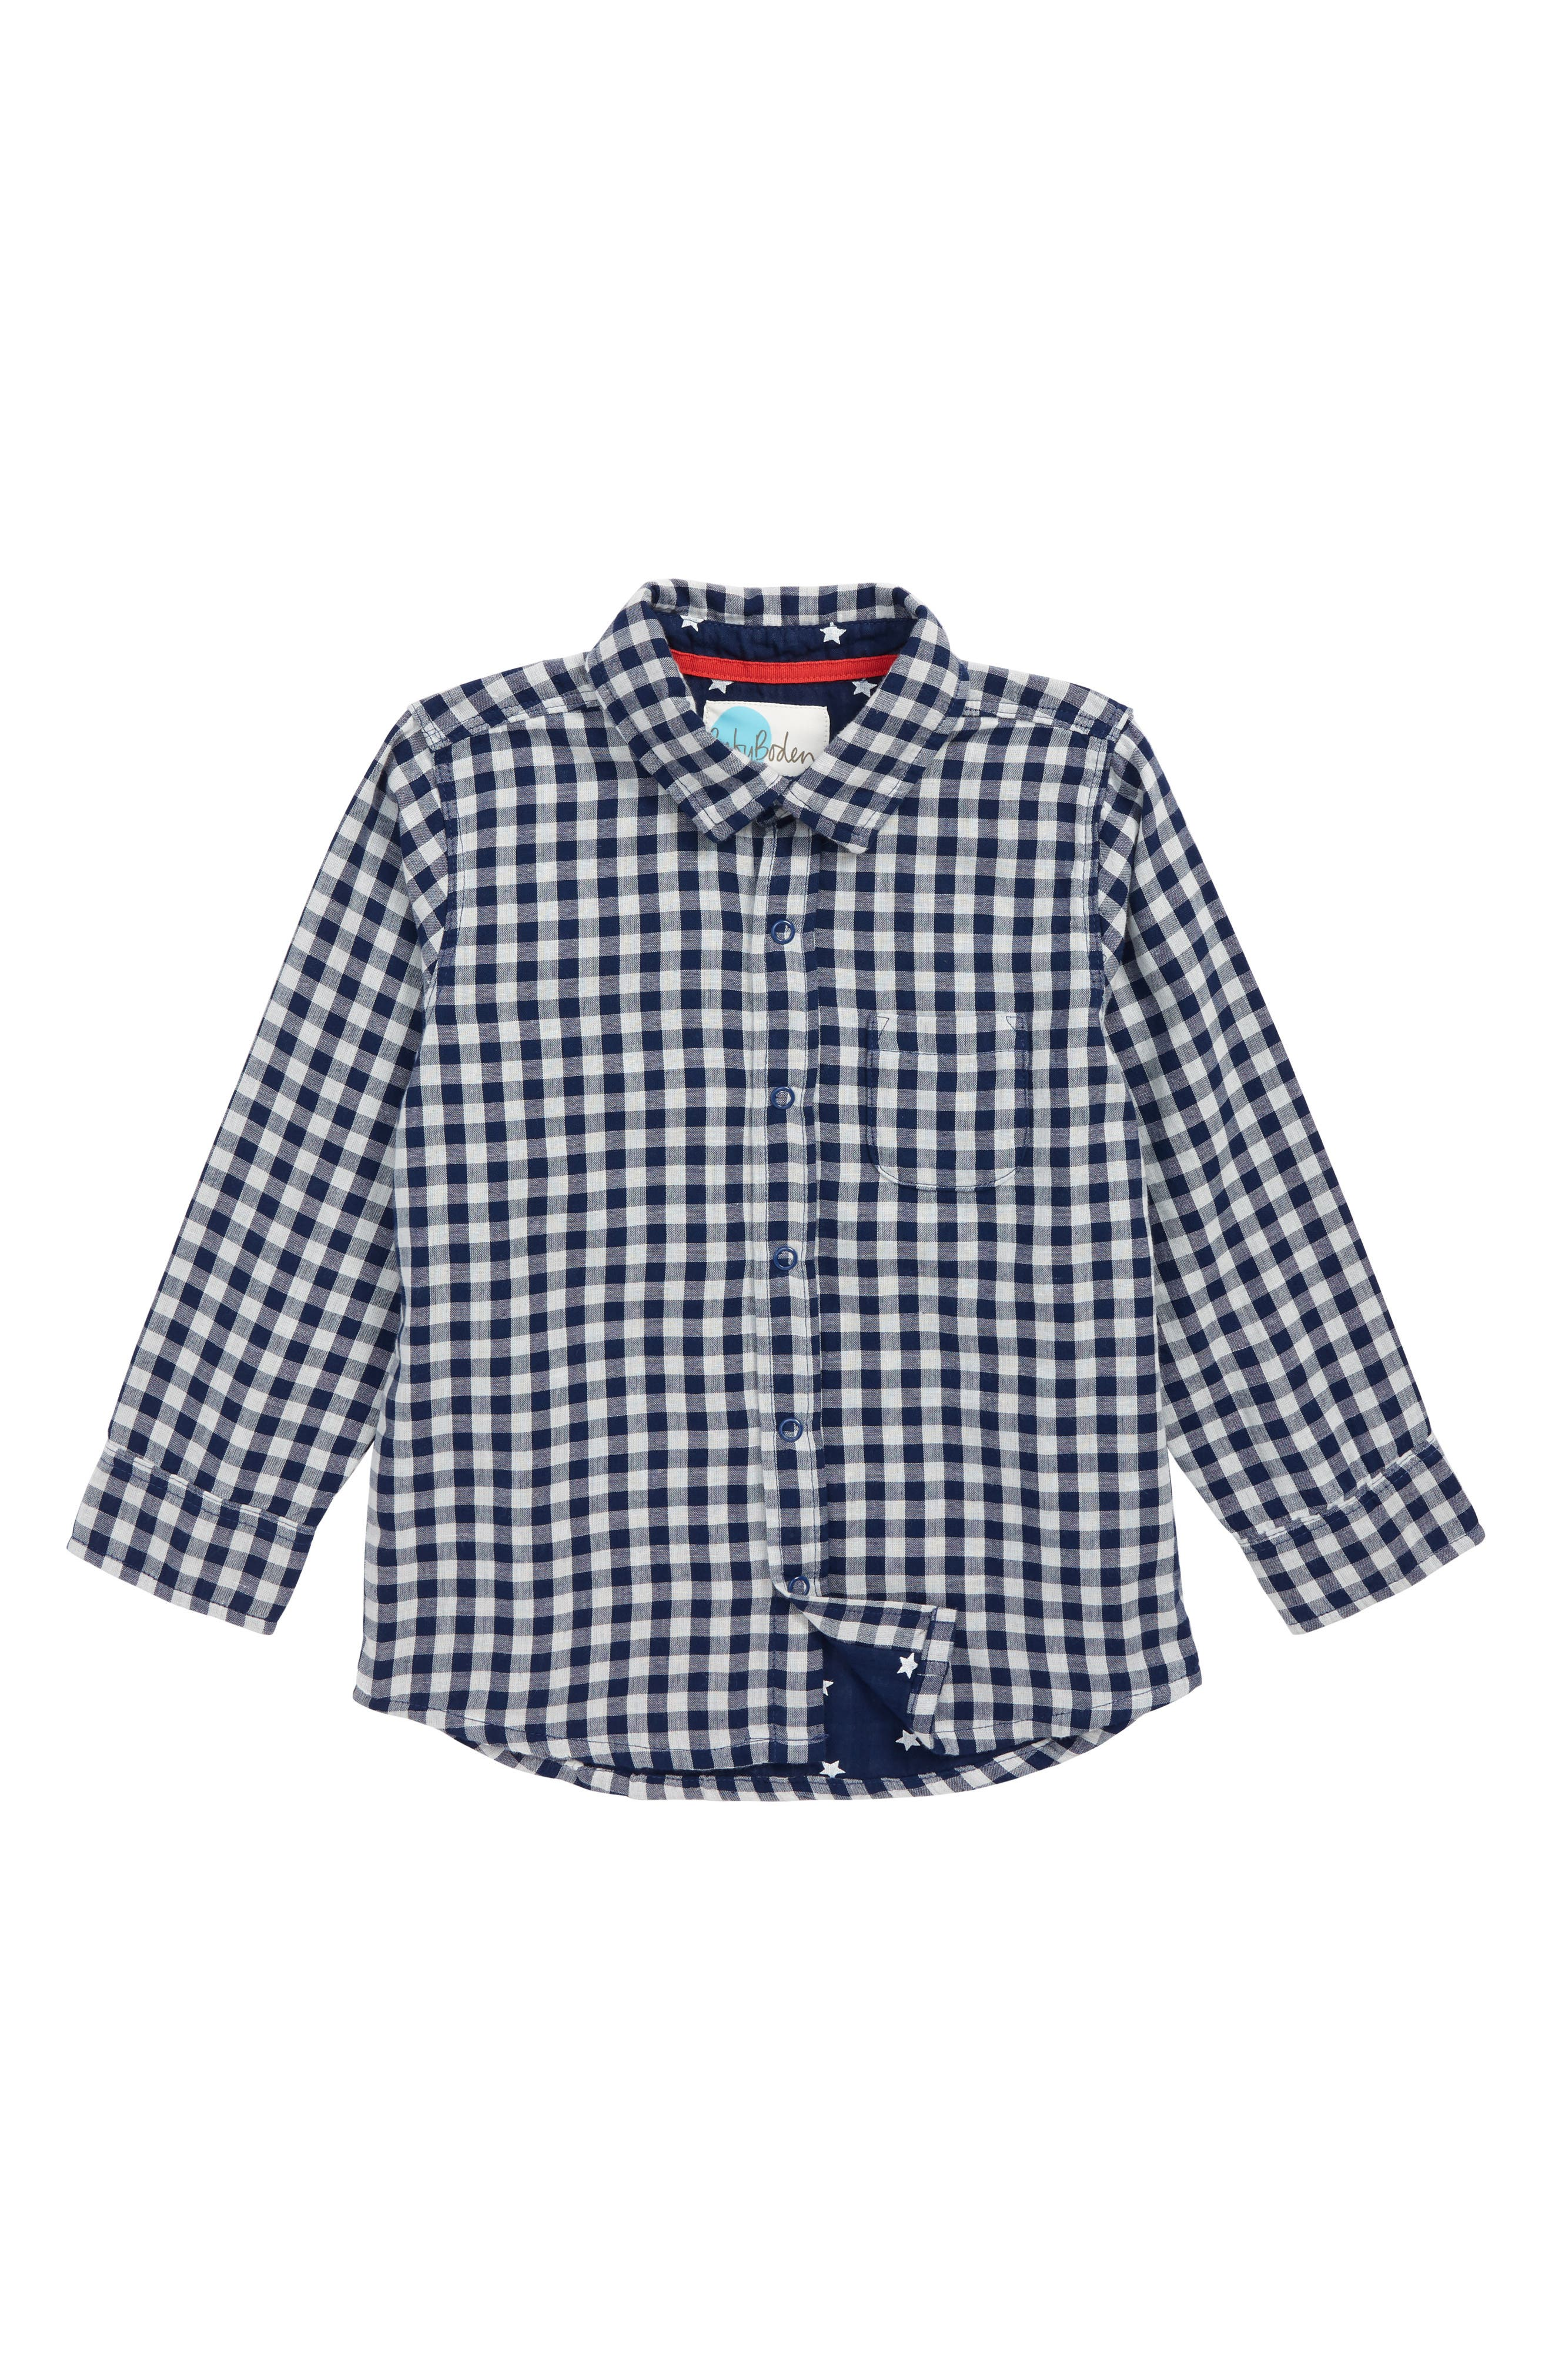 Woven Shirt,                             Main thumbnail 1, color,                             414